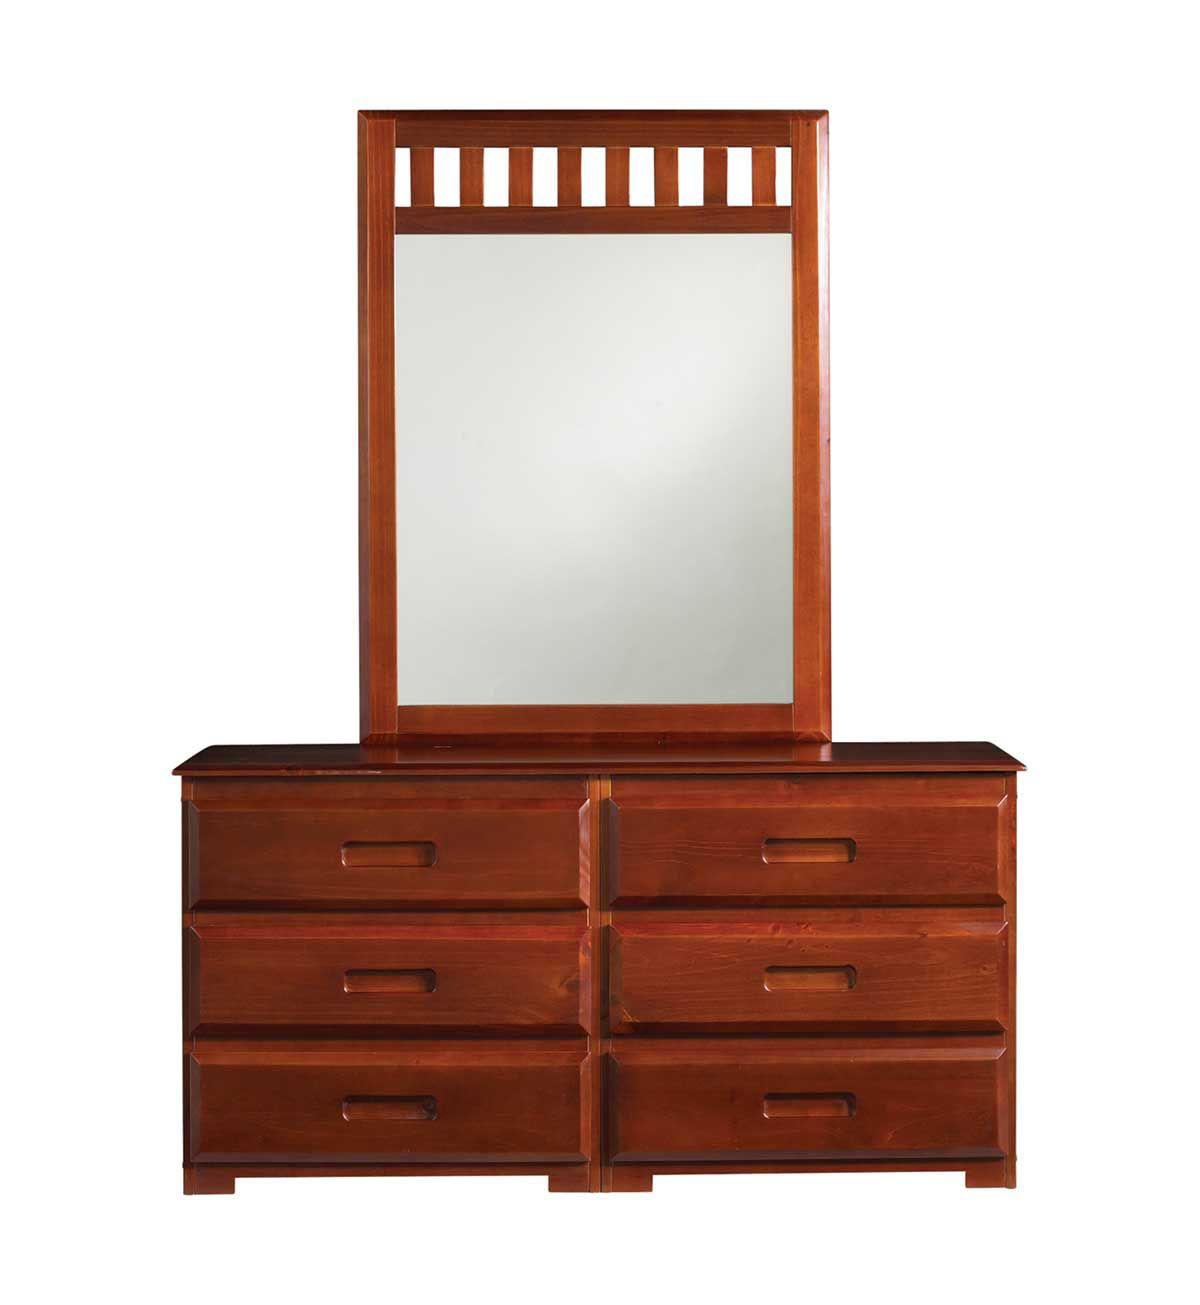 Picture of Forrester Dresser & Mirror